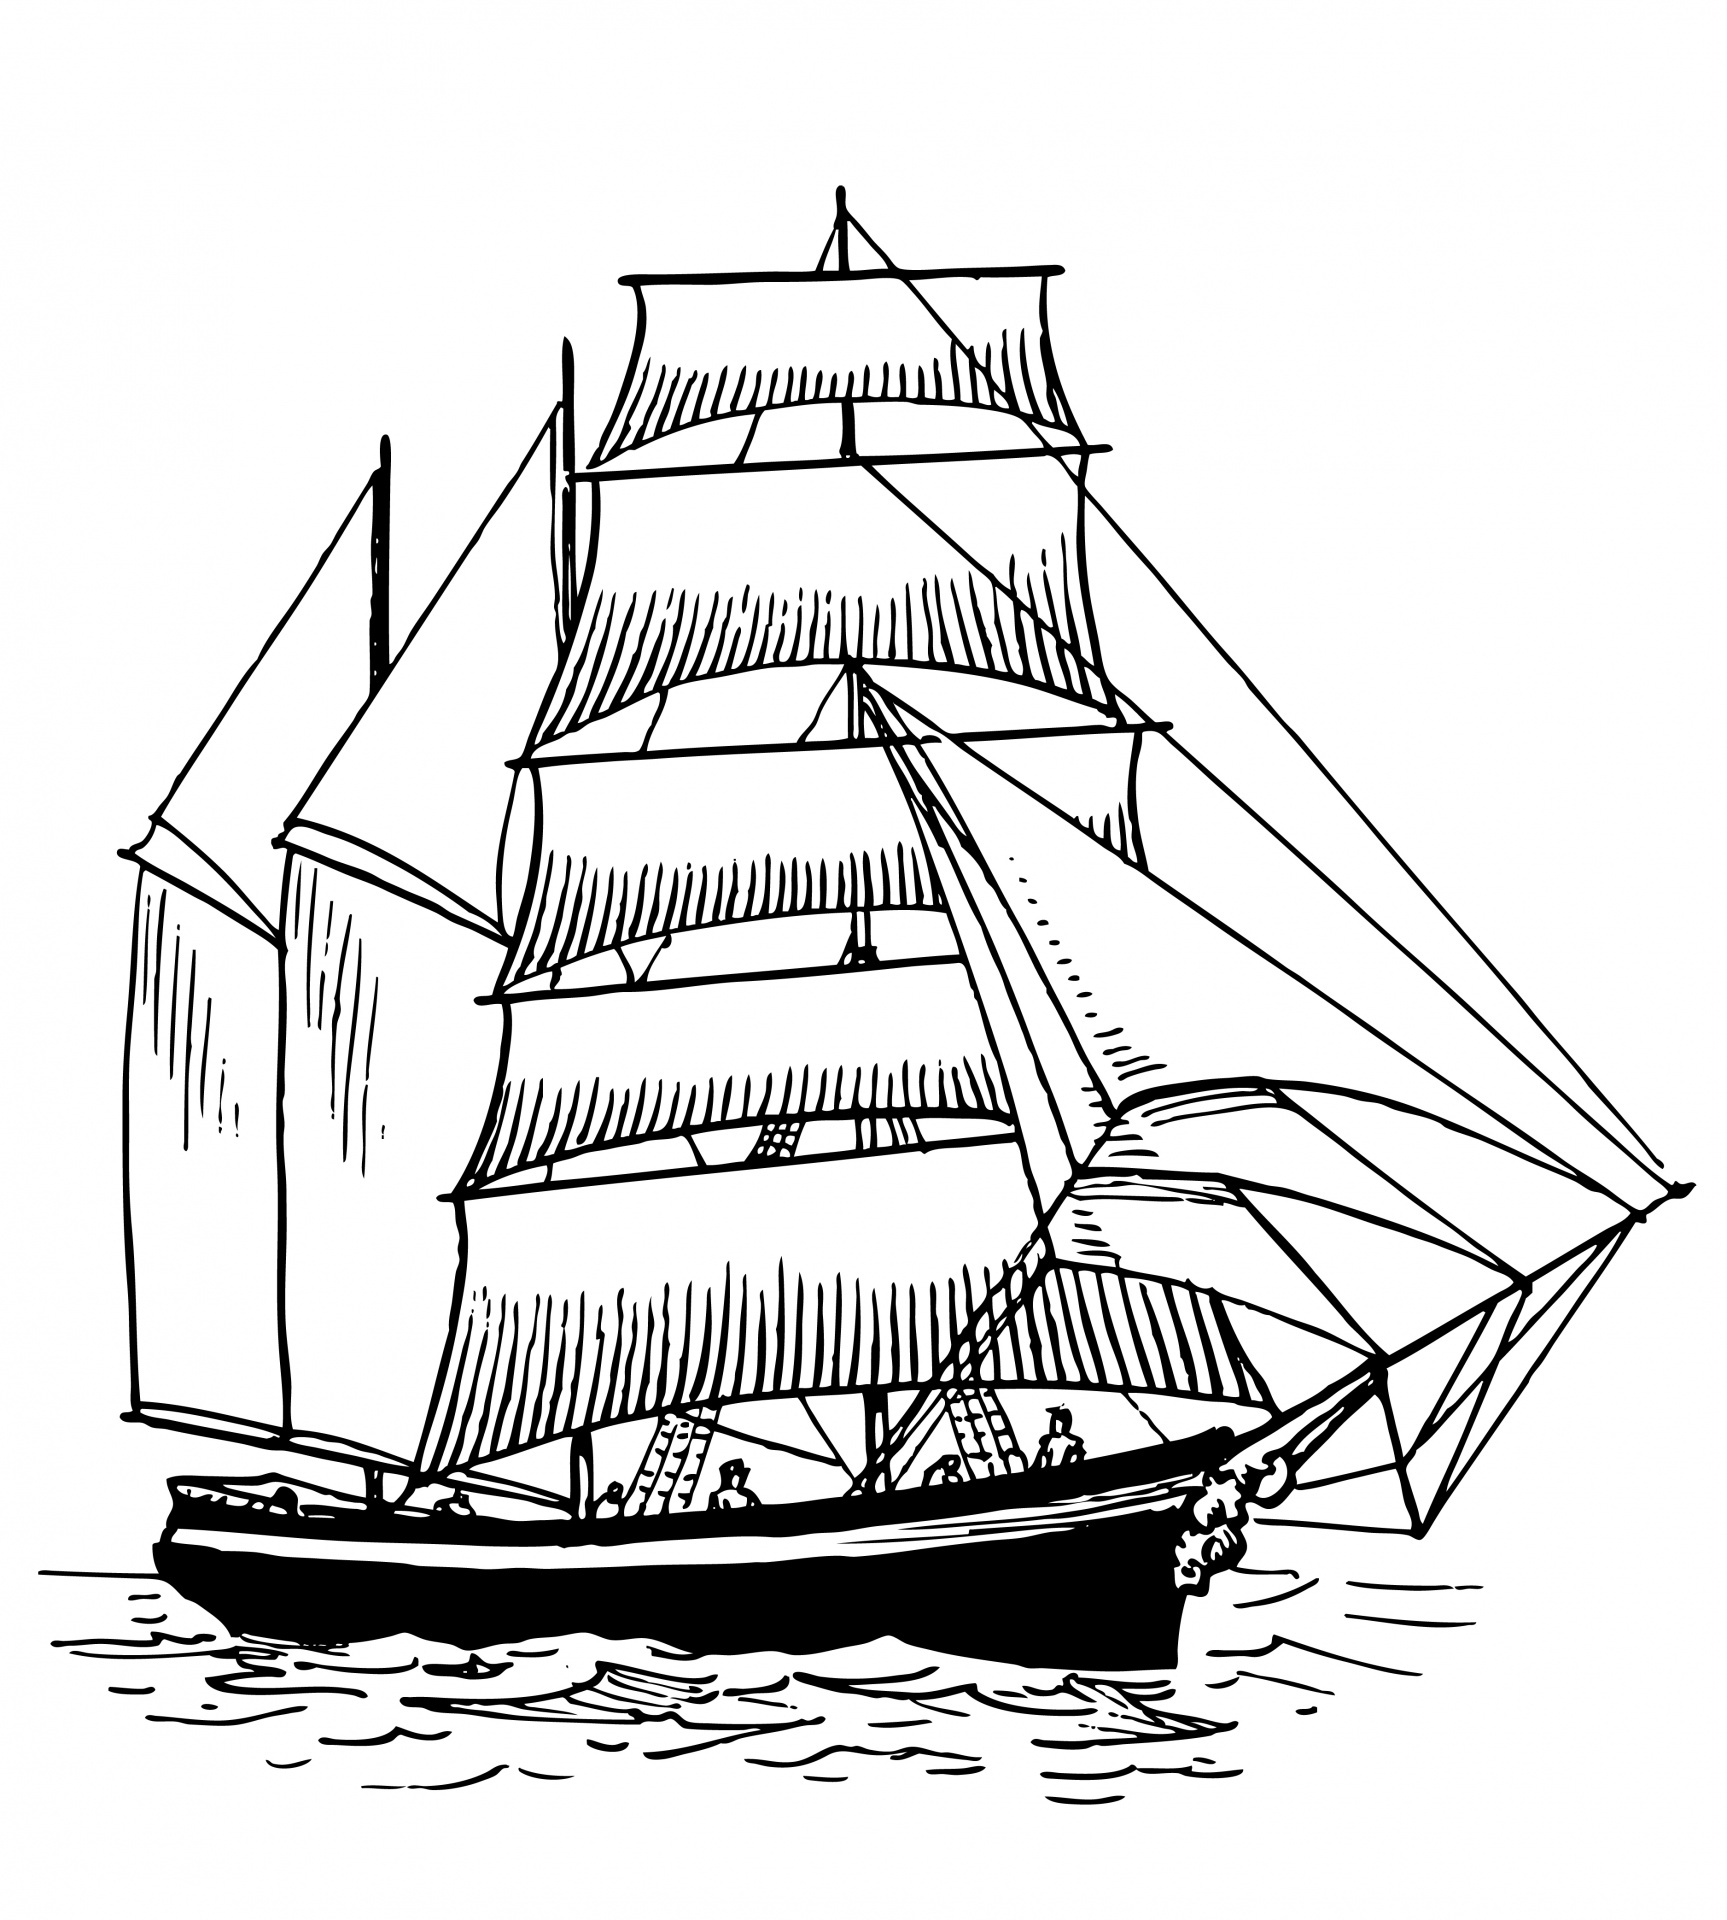 Illustration clipart boat Illustration Illustration Photo Free Clipart